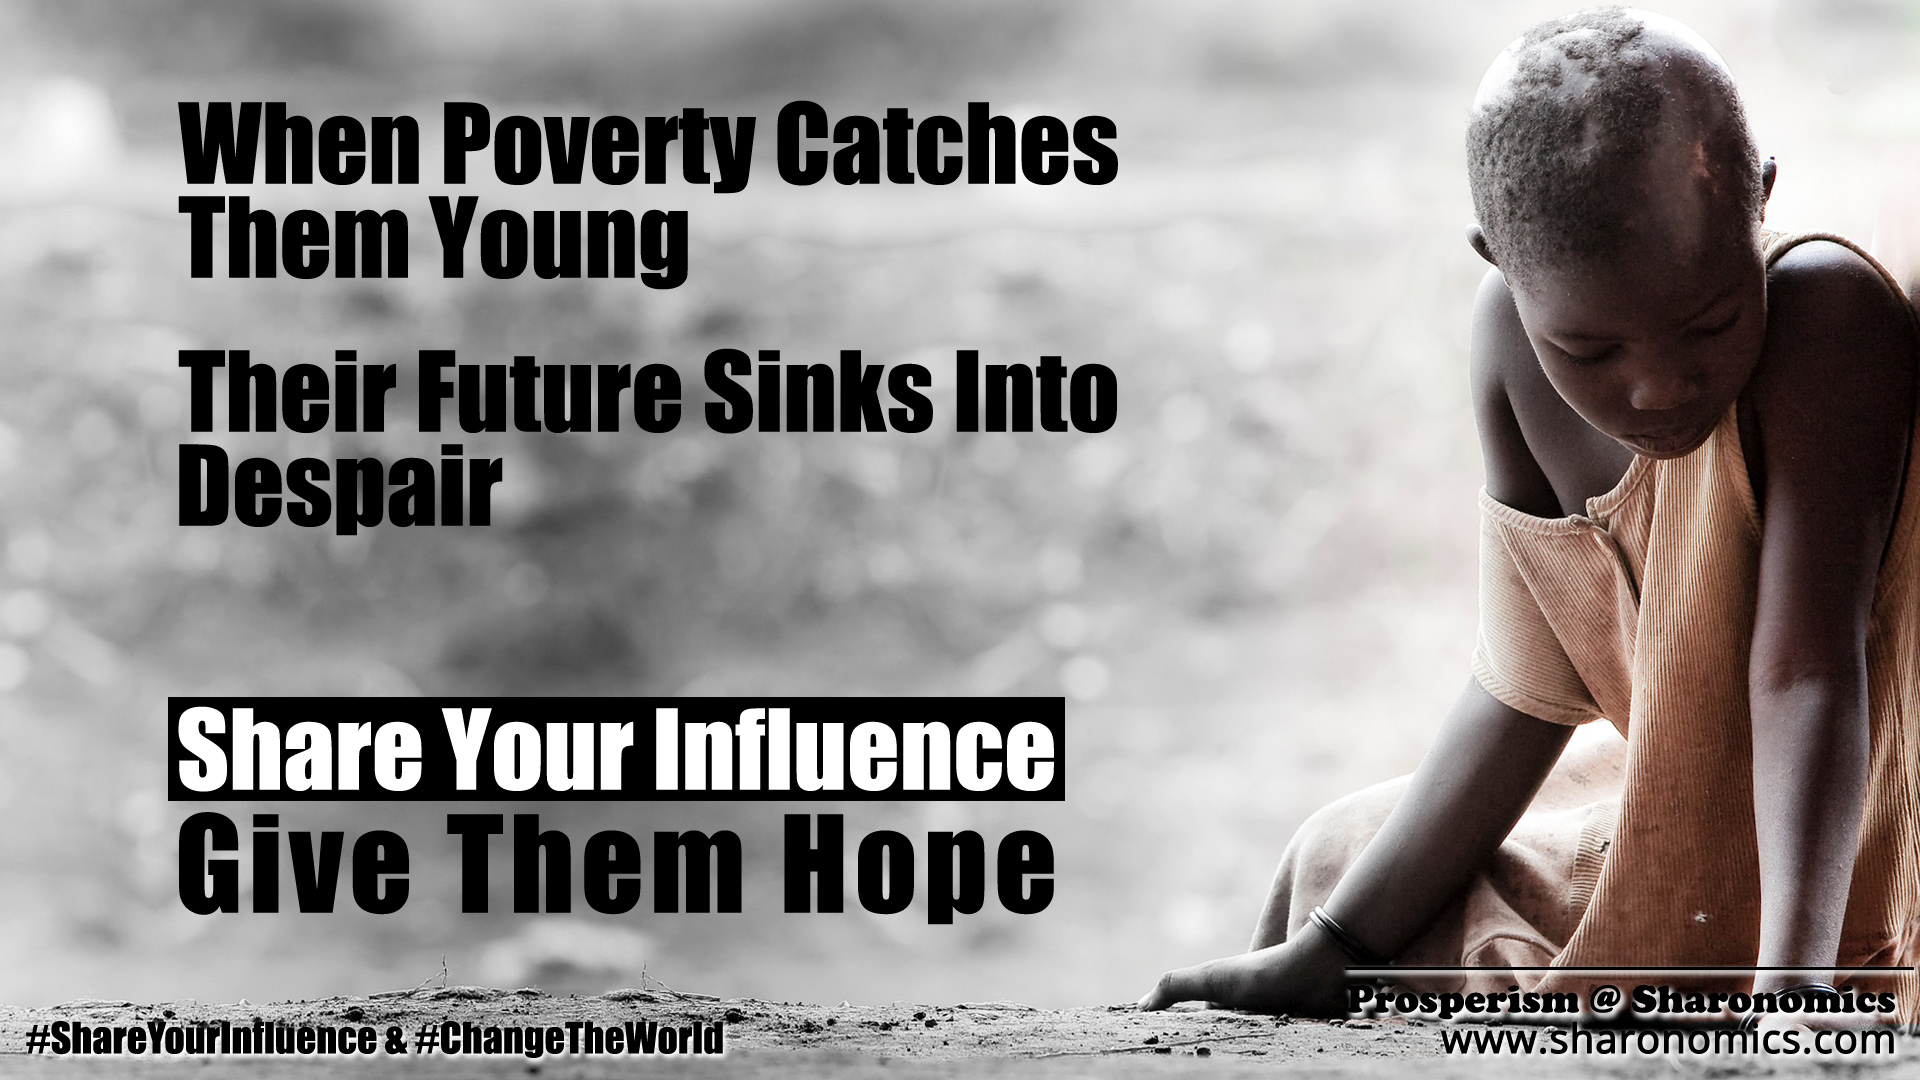 sharonomics, algoshare, prosperism, autonio, poverty, charity, #shareyourinfluence, #changetheworld, poverty, future, young, despair, share, influence, hope